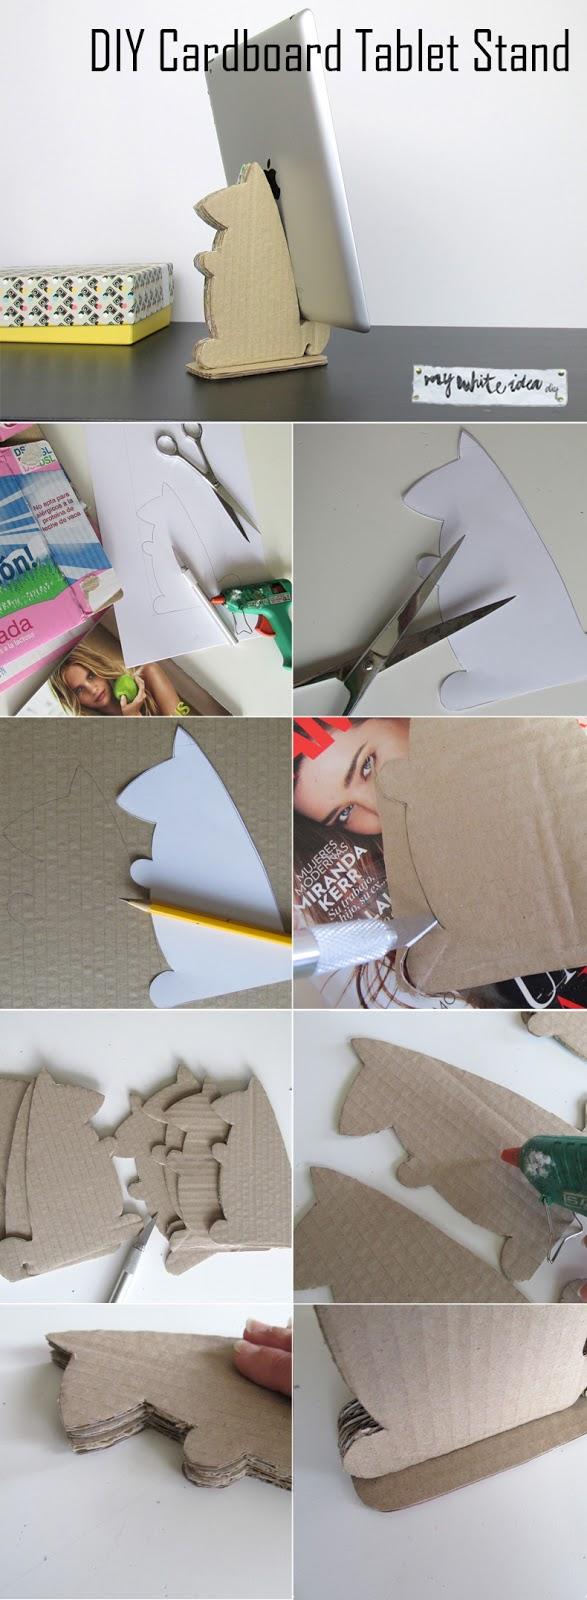 DIY Cardboard Tablet Stand | MY WHITE IDEA DIY